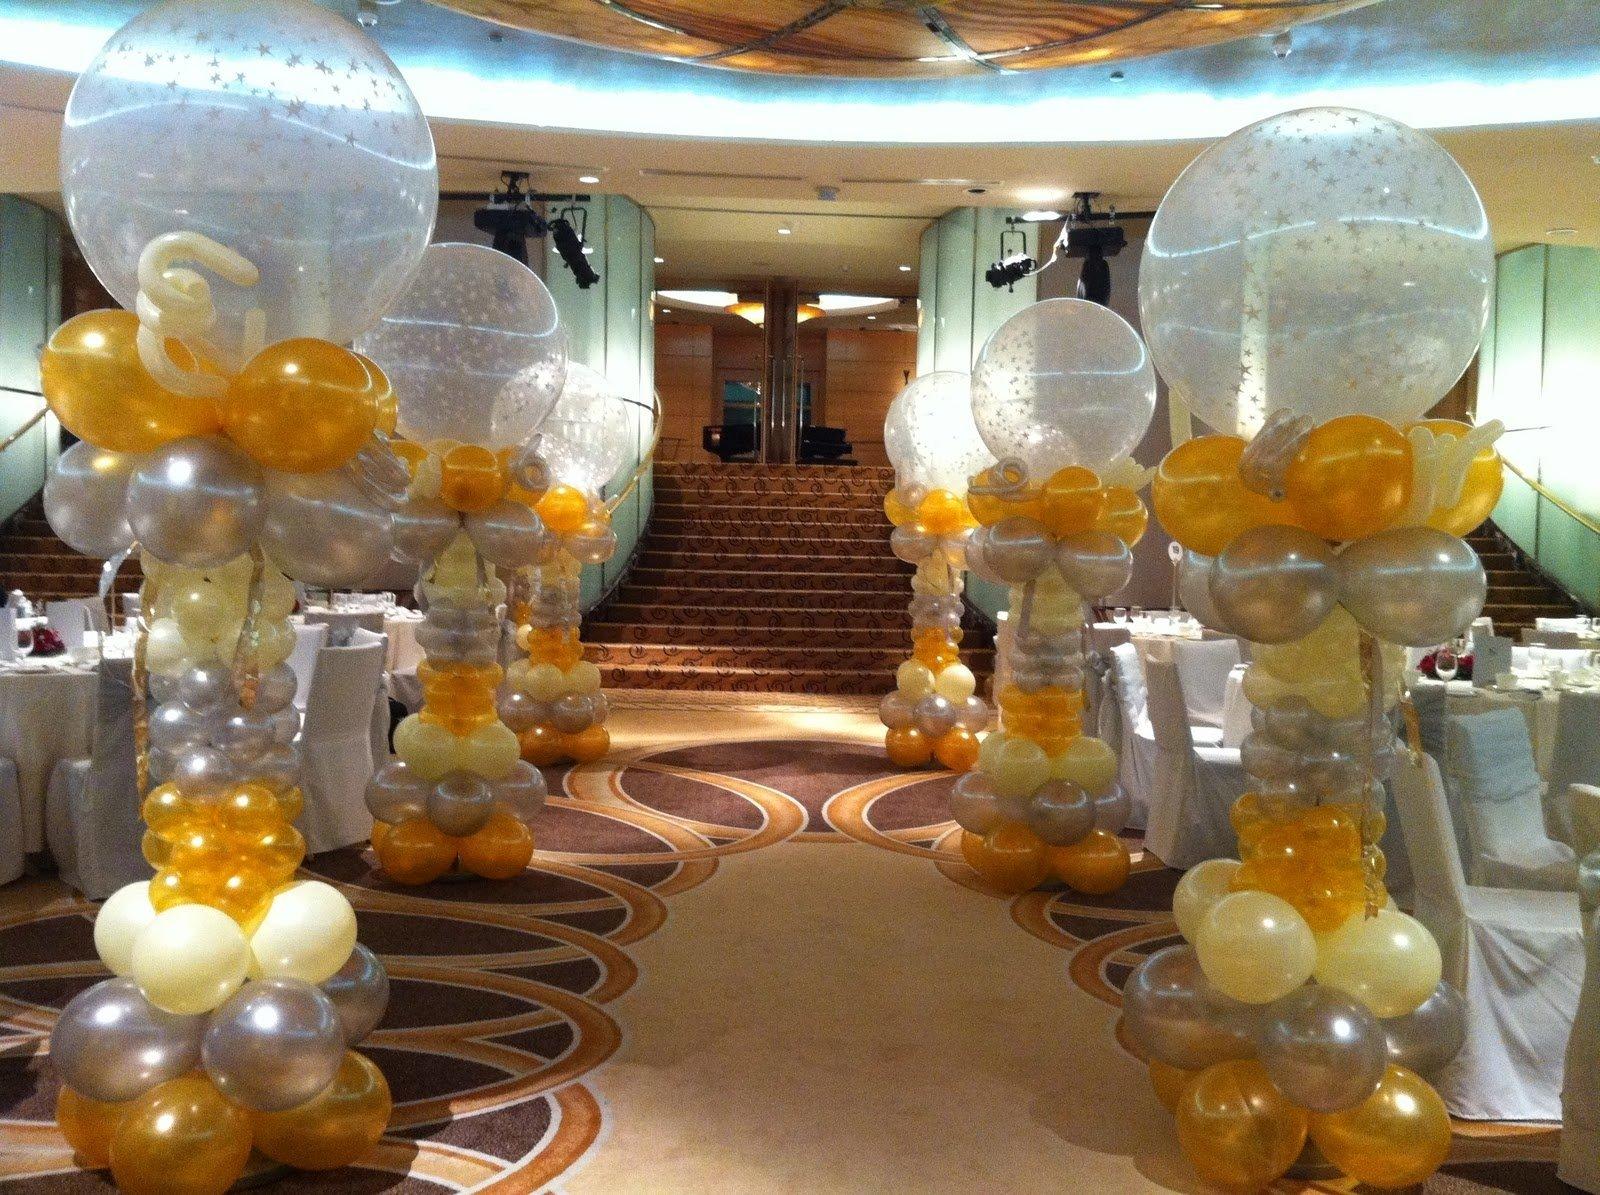 10 Attractive Party Decoration Ideas For Adults birthday party decorating ideas adults decorations tierra este 2020